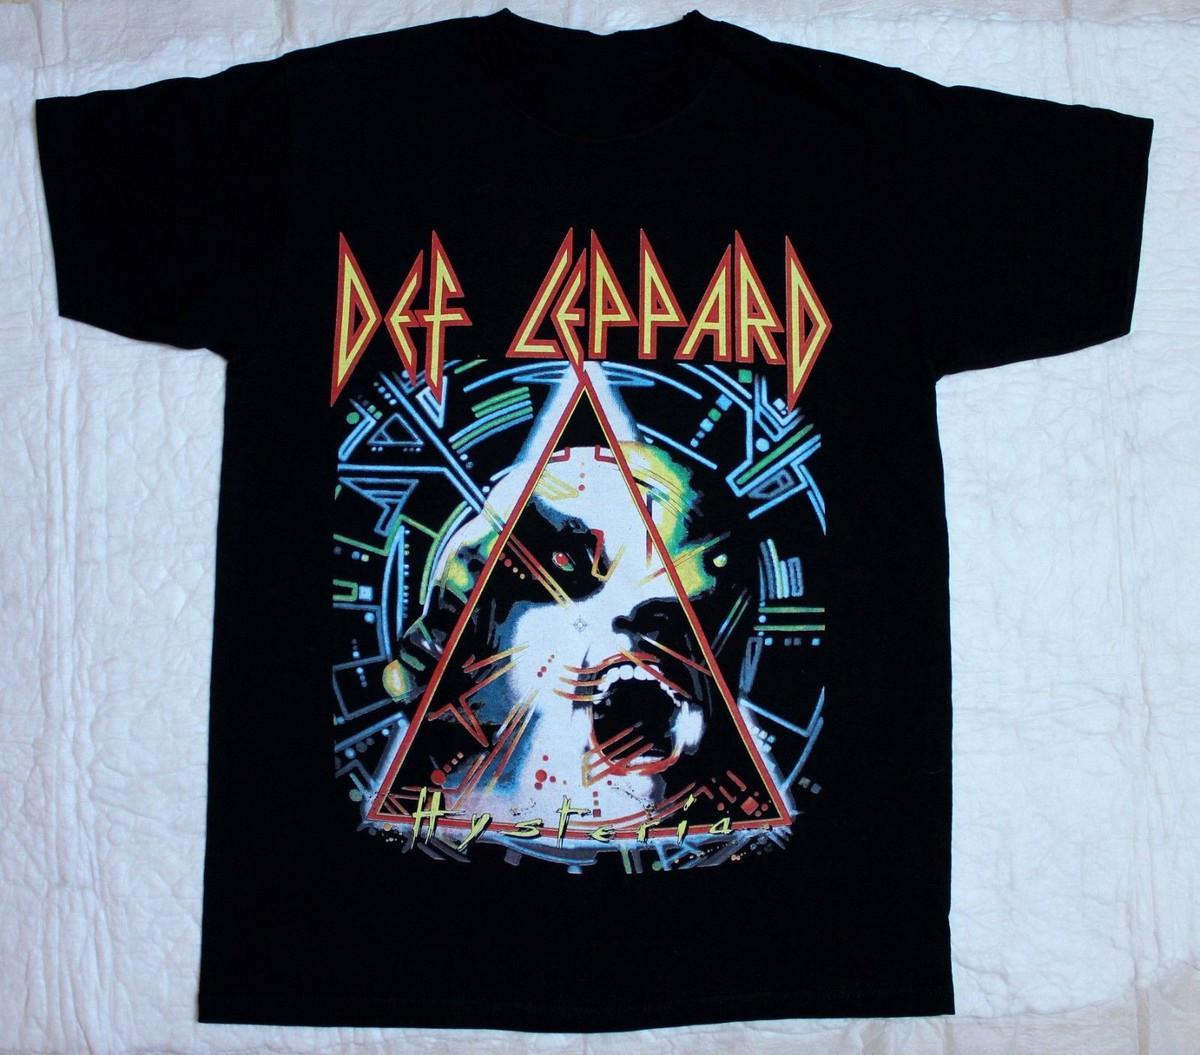 Def Leppard - Hysteria Tour 88 Black T-shirt O-Fashion عارضة عالية الجودة طباعة تي شيرت الرجال تي شيرت الجدة س الرقبة بلايز